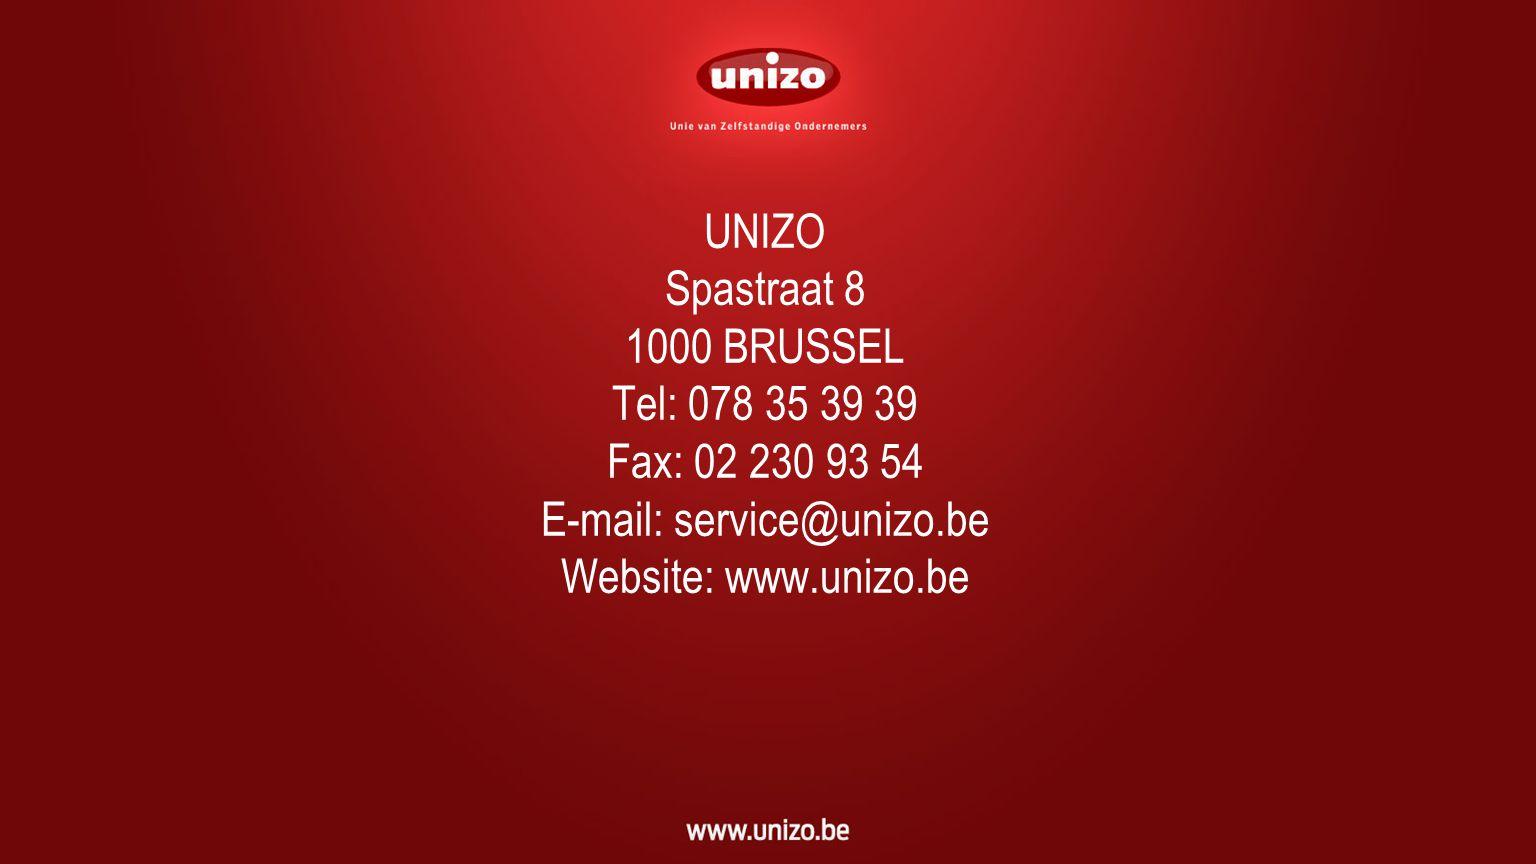 UNIZO Spastraat 8 1000 BRUSSEL Tel: 078 35 39 39 Fax: 02 230 93 54 E-mail: service@unizo.be Website: www.unizo.be